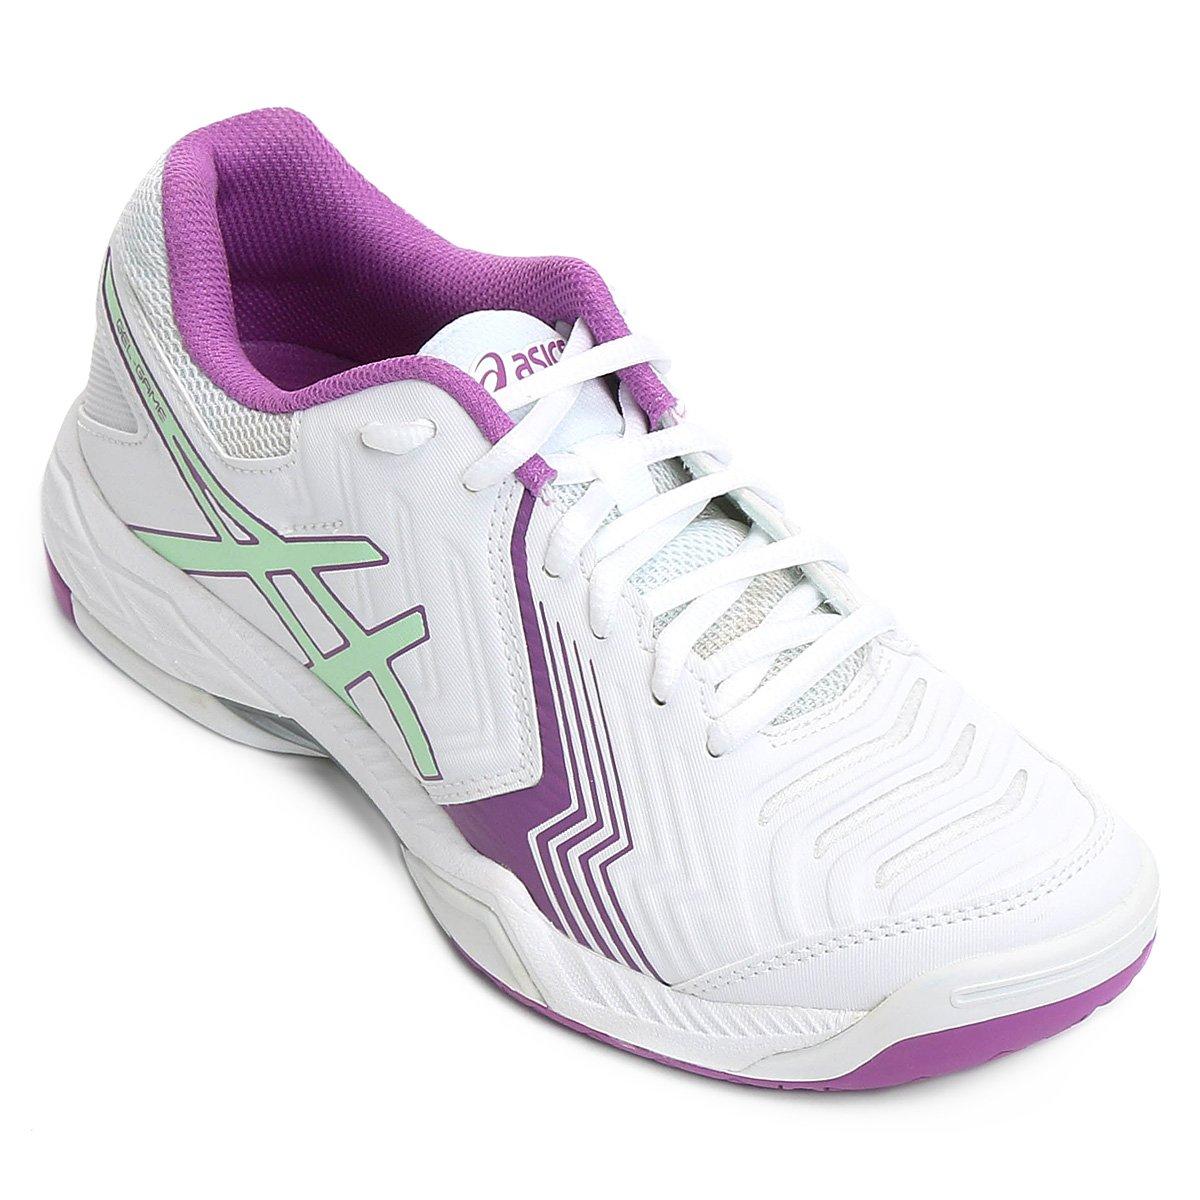 31b031b9aa Tênis Asics Gel Game 6 Feminino - Compre Agora